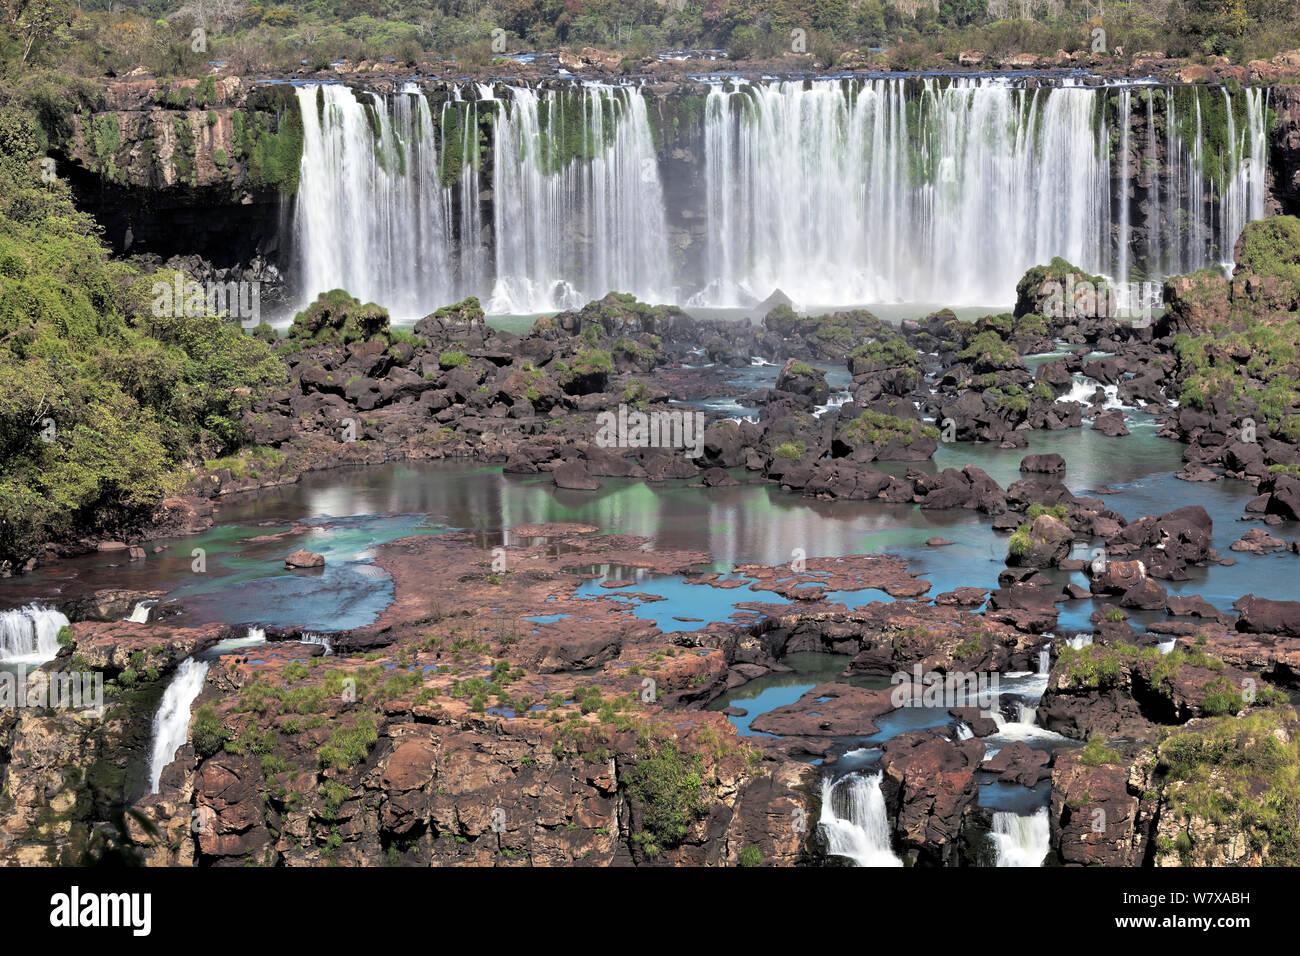 Salto Rivadavia, Iguazu falls, Brazil/Argentina. September 2010. Stock Photo